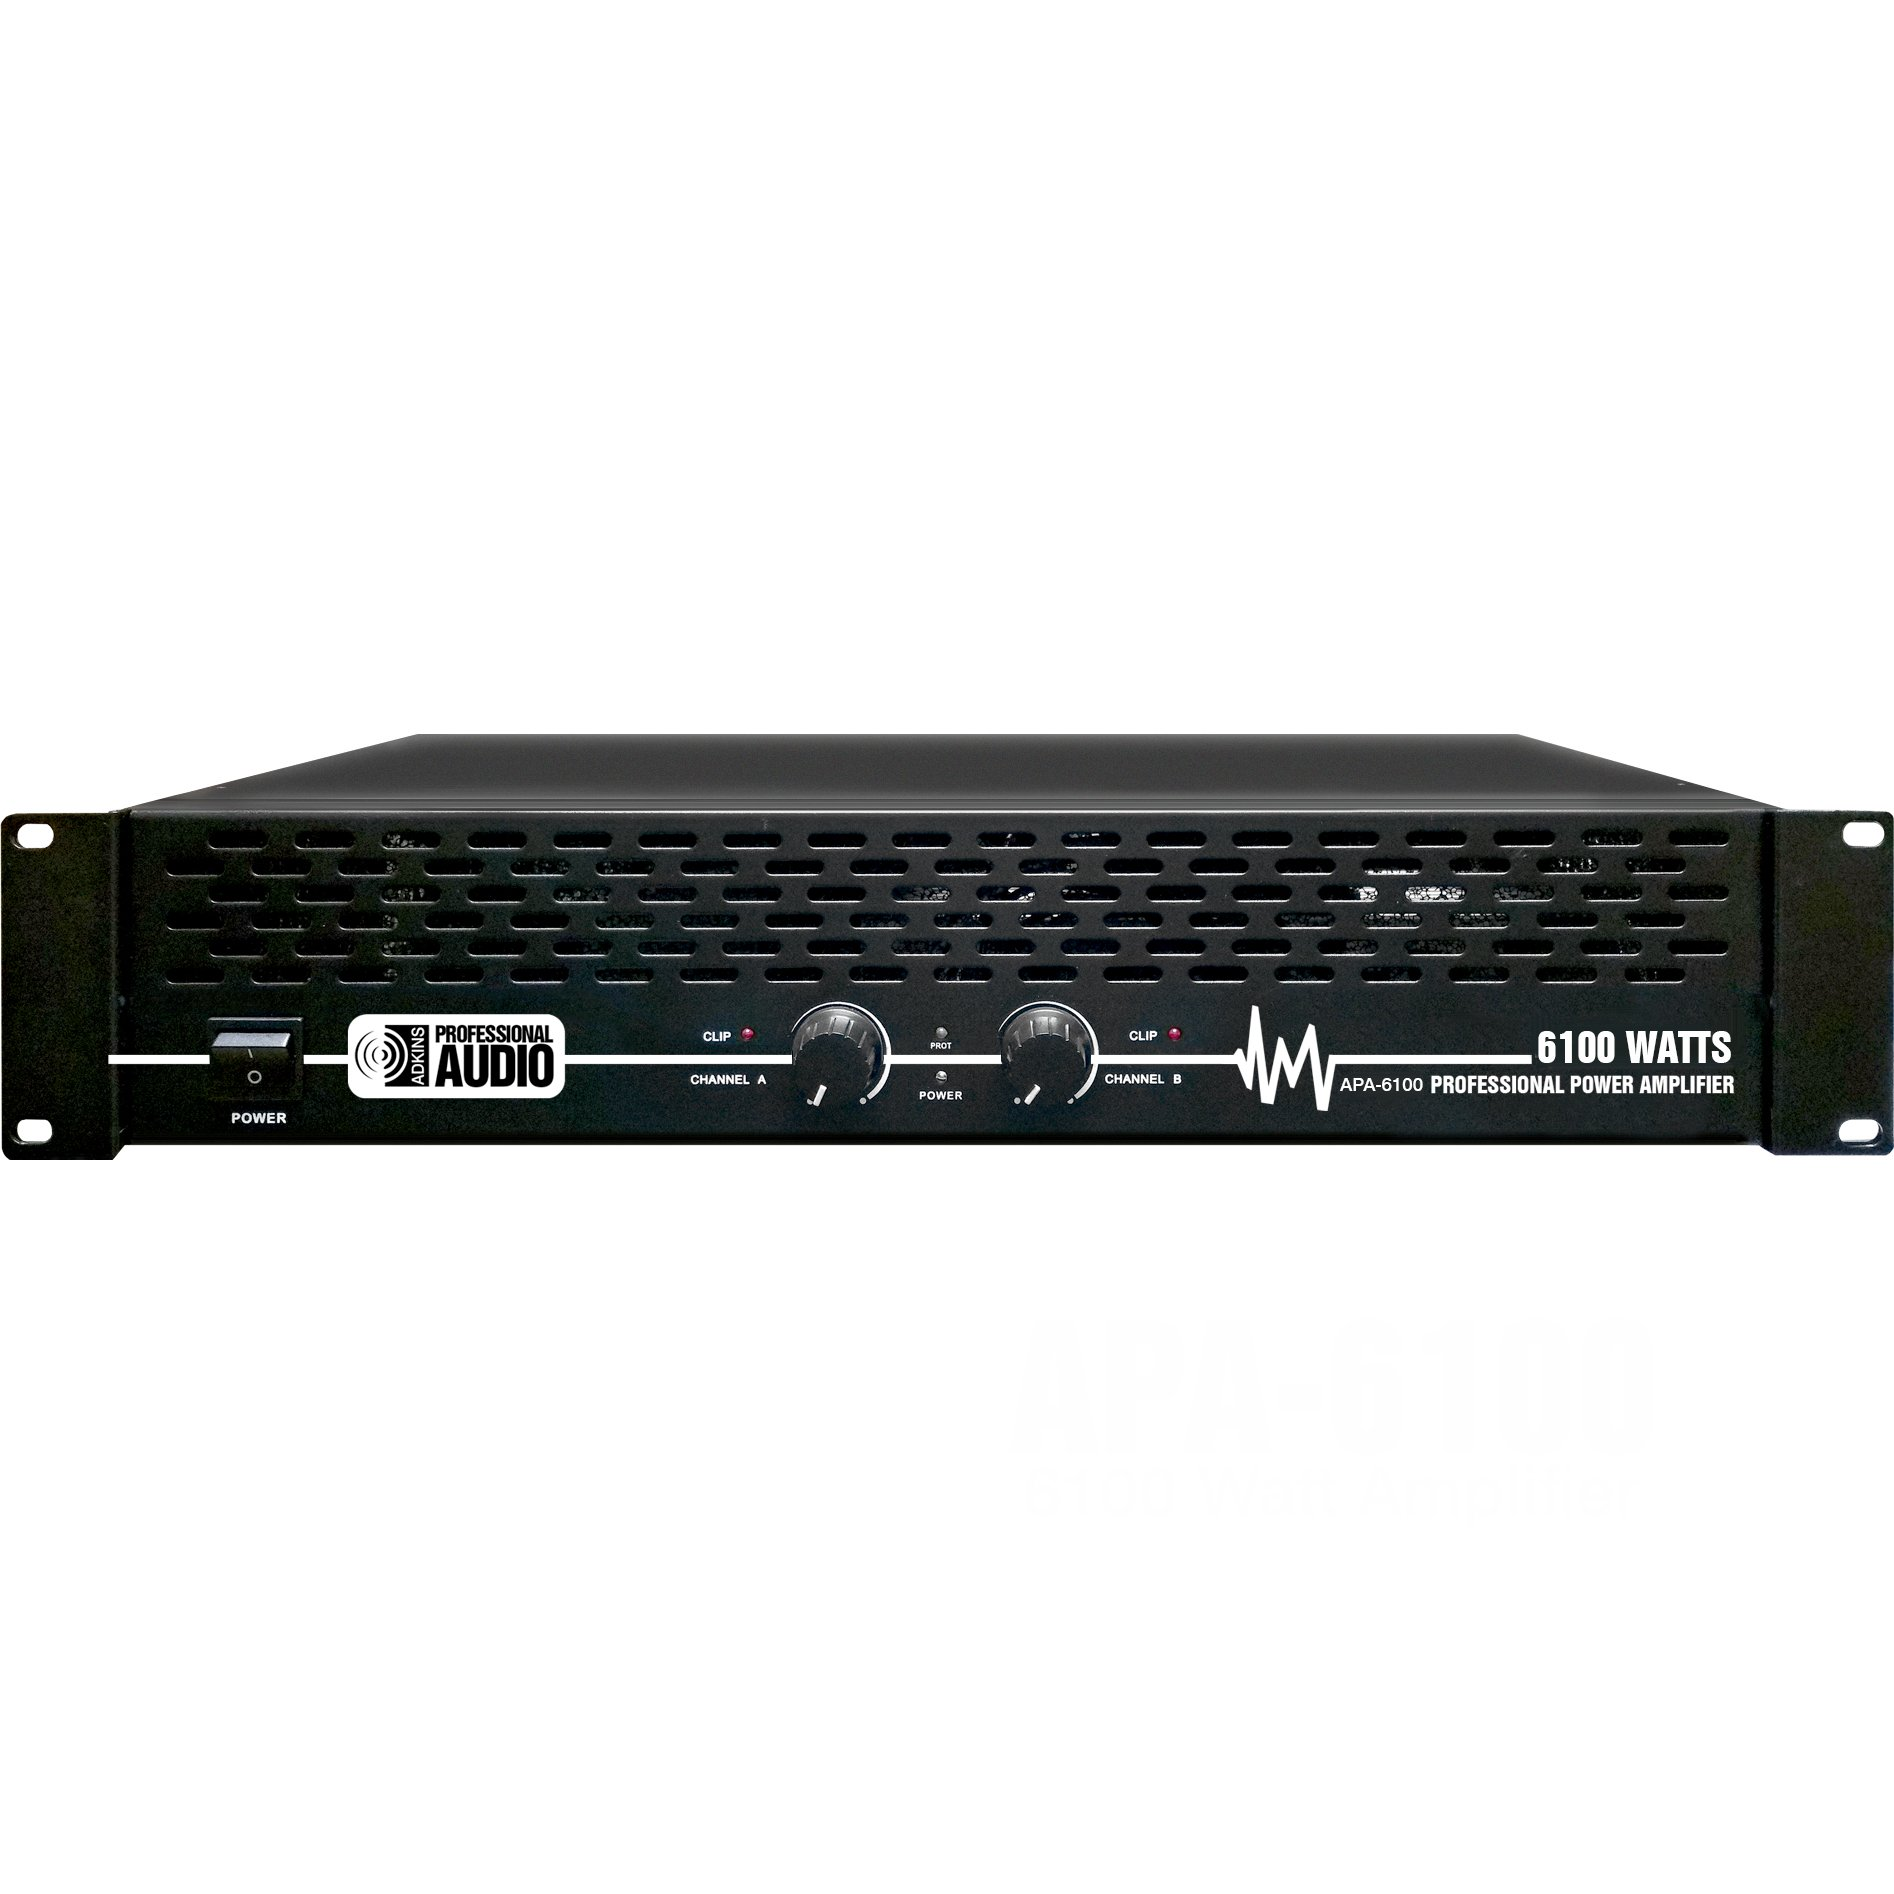 6100 Watt Professional DJ Power Amplifier - Adkins Pro Audio - Quality Audio at Aforadable Prices!